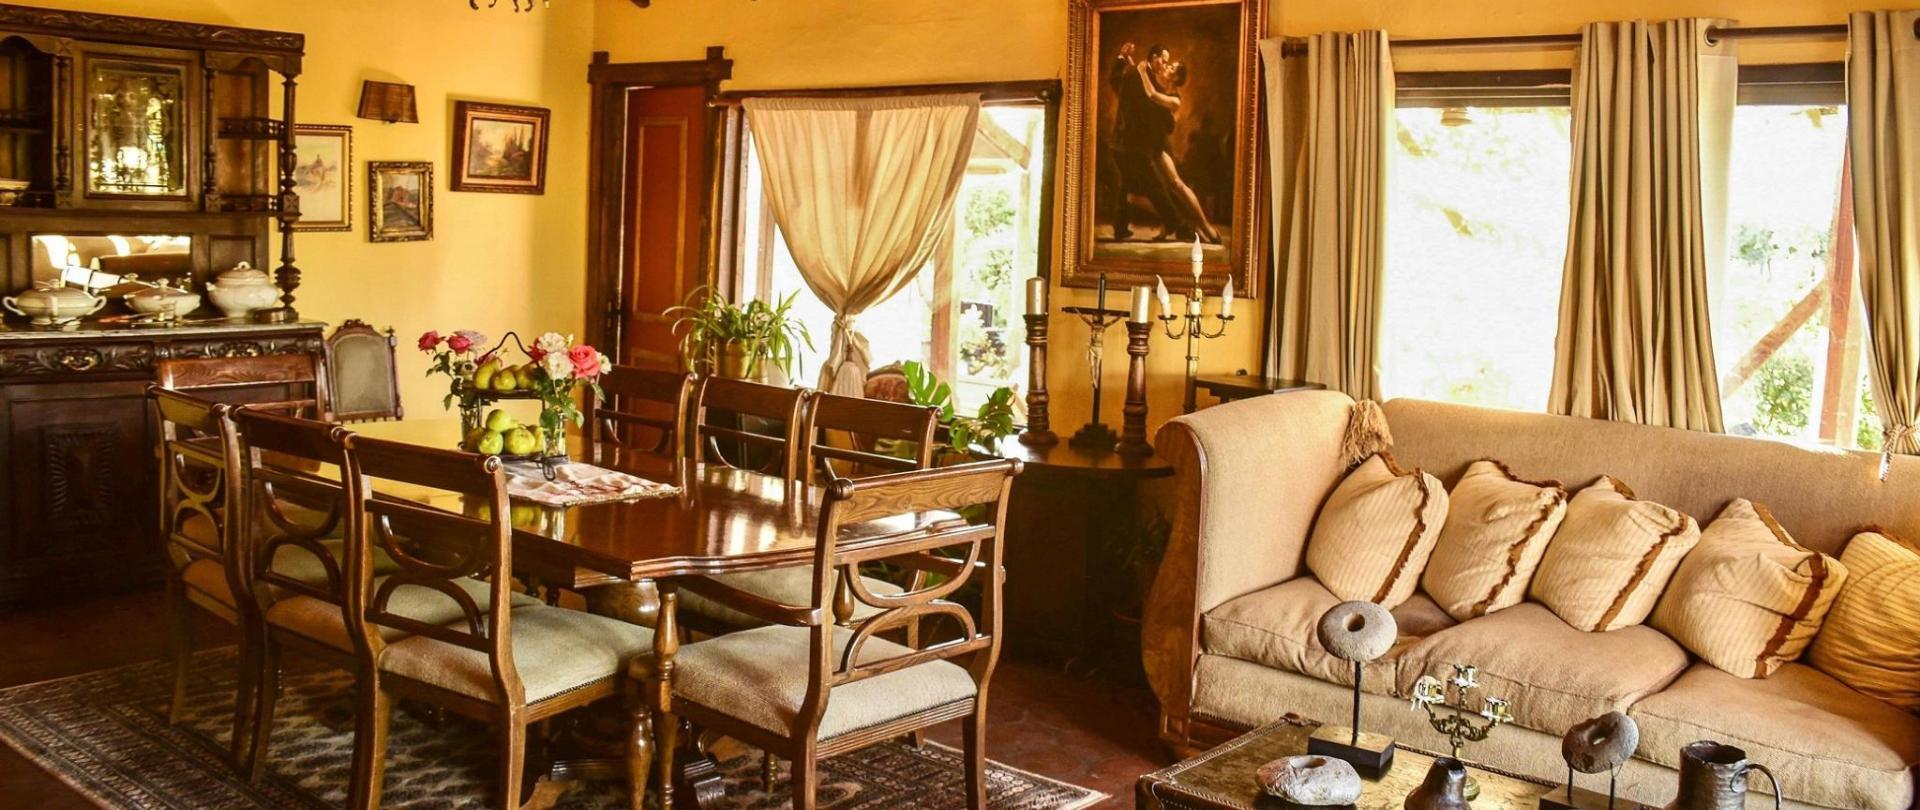 Hotel Vendimia Parador - Santa Cruz - Colchagua (2)-min.jpg